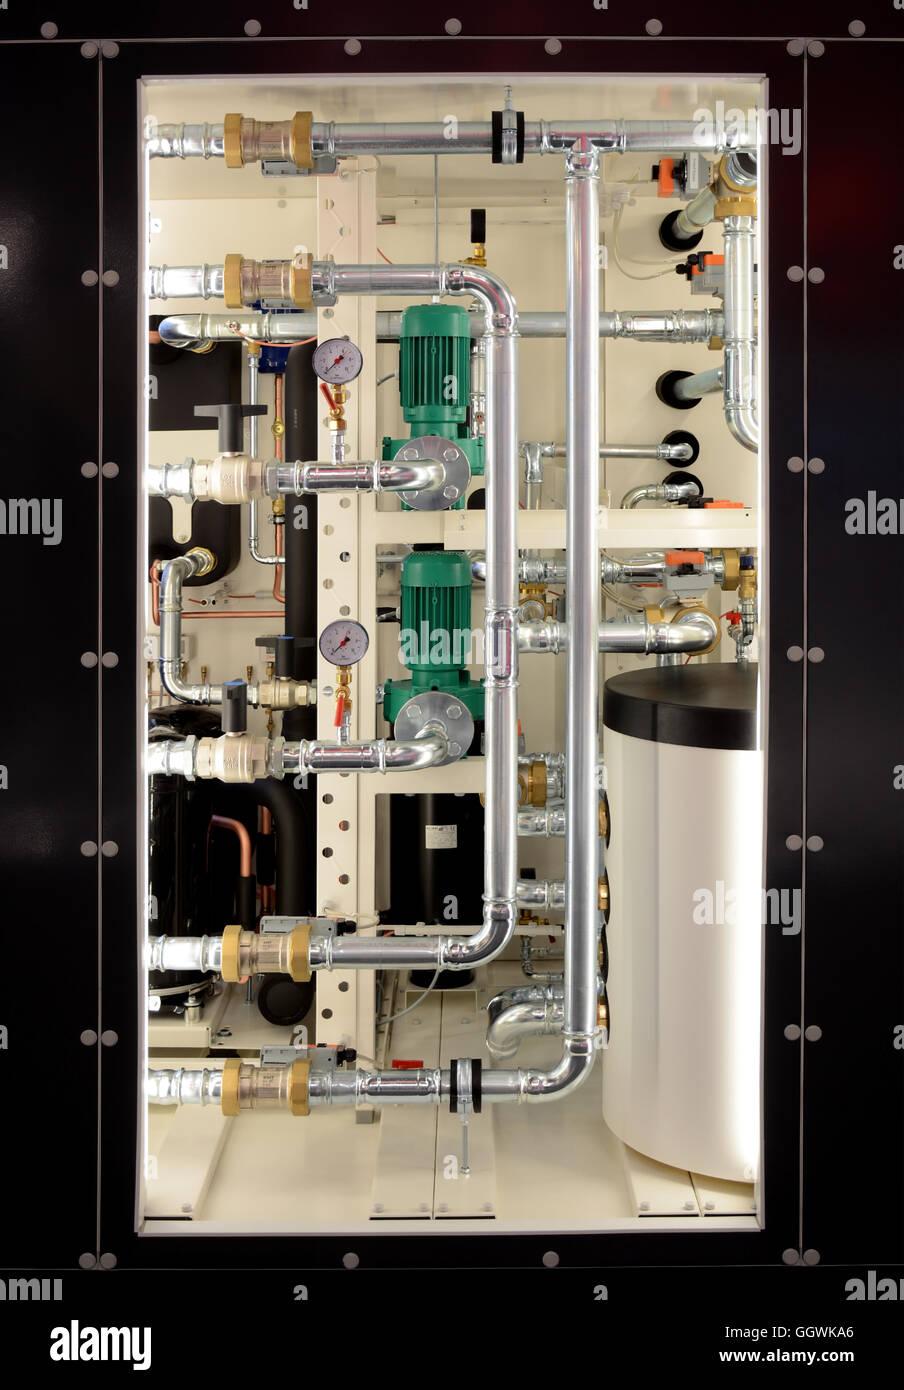 Boiler Pipes Stockfotos & Boiler Pipes Bilder - Alamy